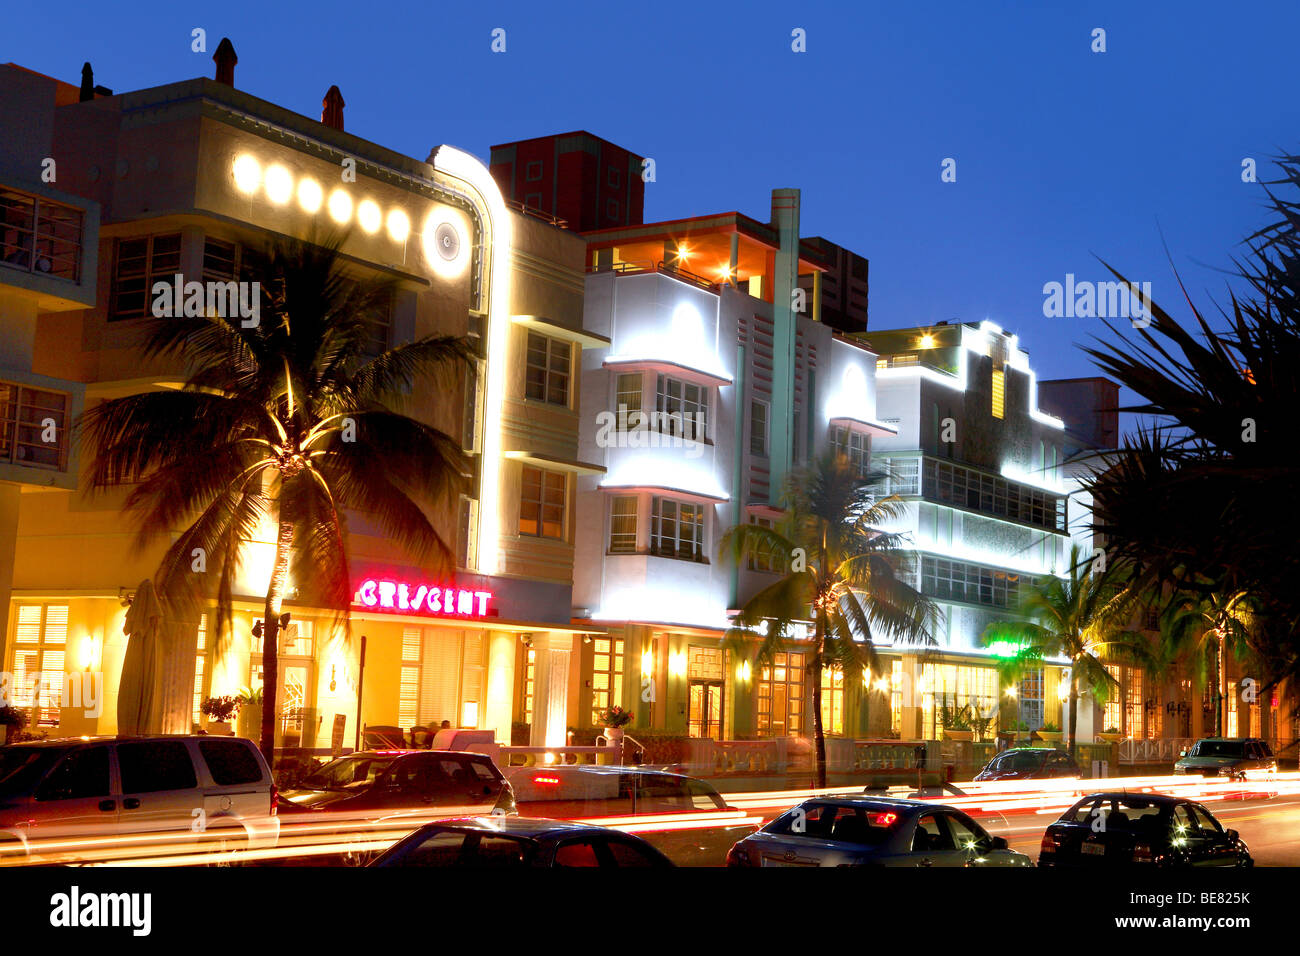 illuminated hotels on ocean drive at night, south beach